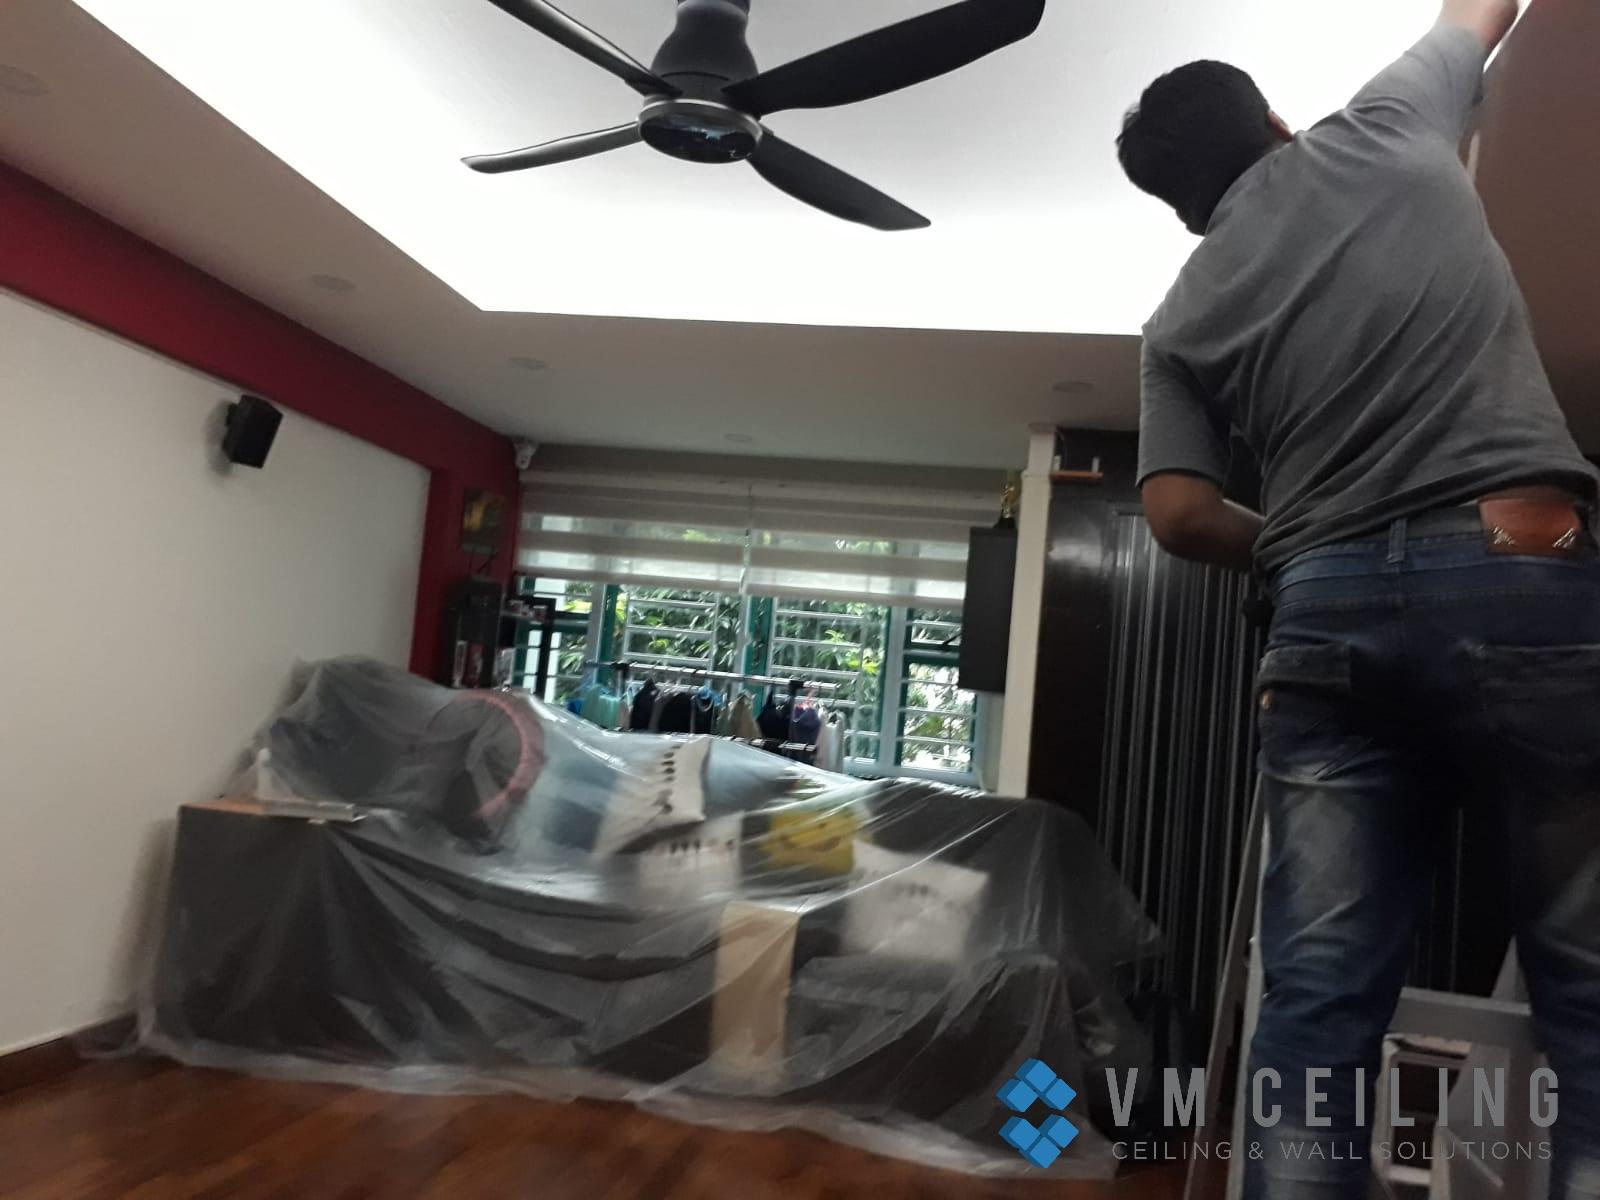 Living Room False Ceiling Downlights Installation vm ceiling Singapore HDB Admiralty 2